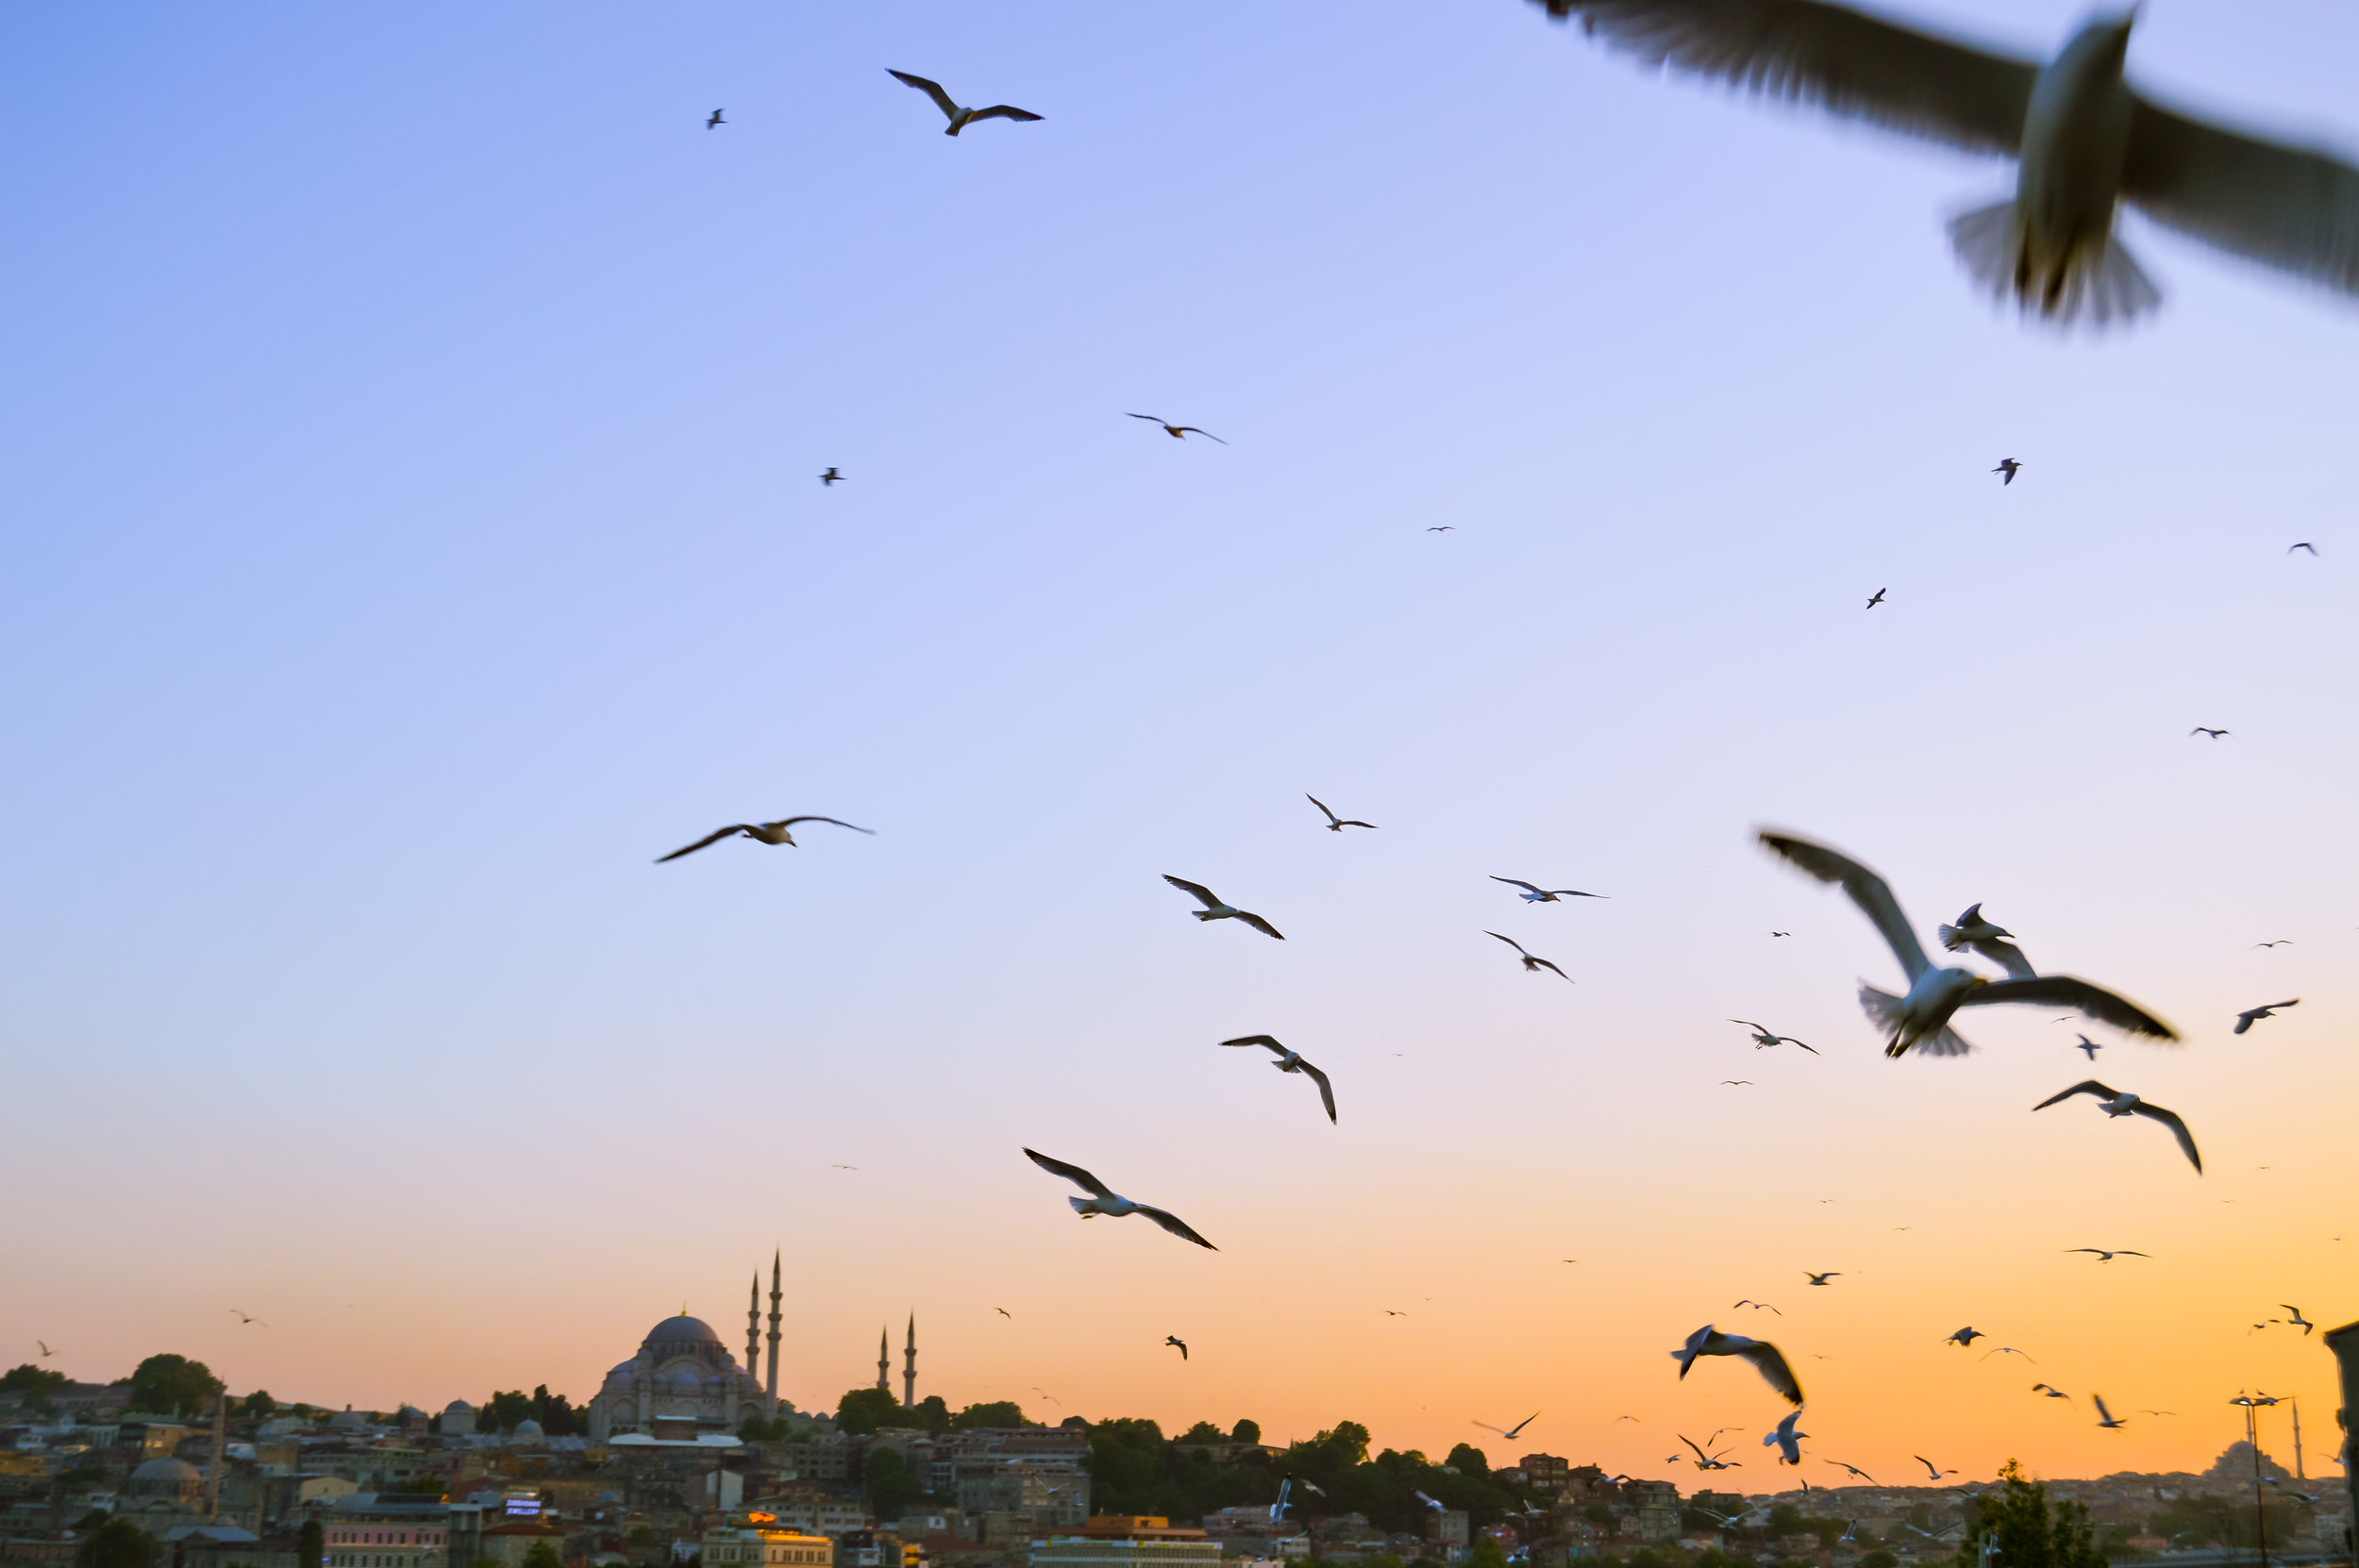 View from Galata Bridge Rowhomes Mosques Skyline Bosporus Bosphorus Blue Sky Muslim Ottoman Empire Architecture Istanbul Turkey Blue Mosque Hagia Sophia